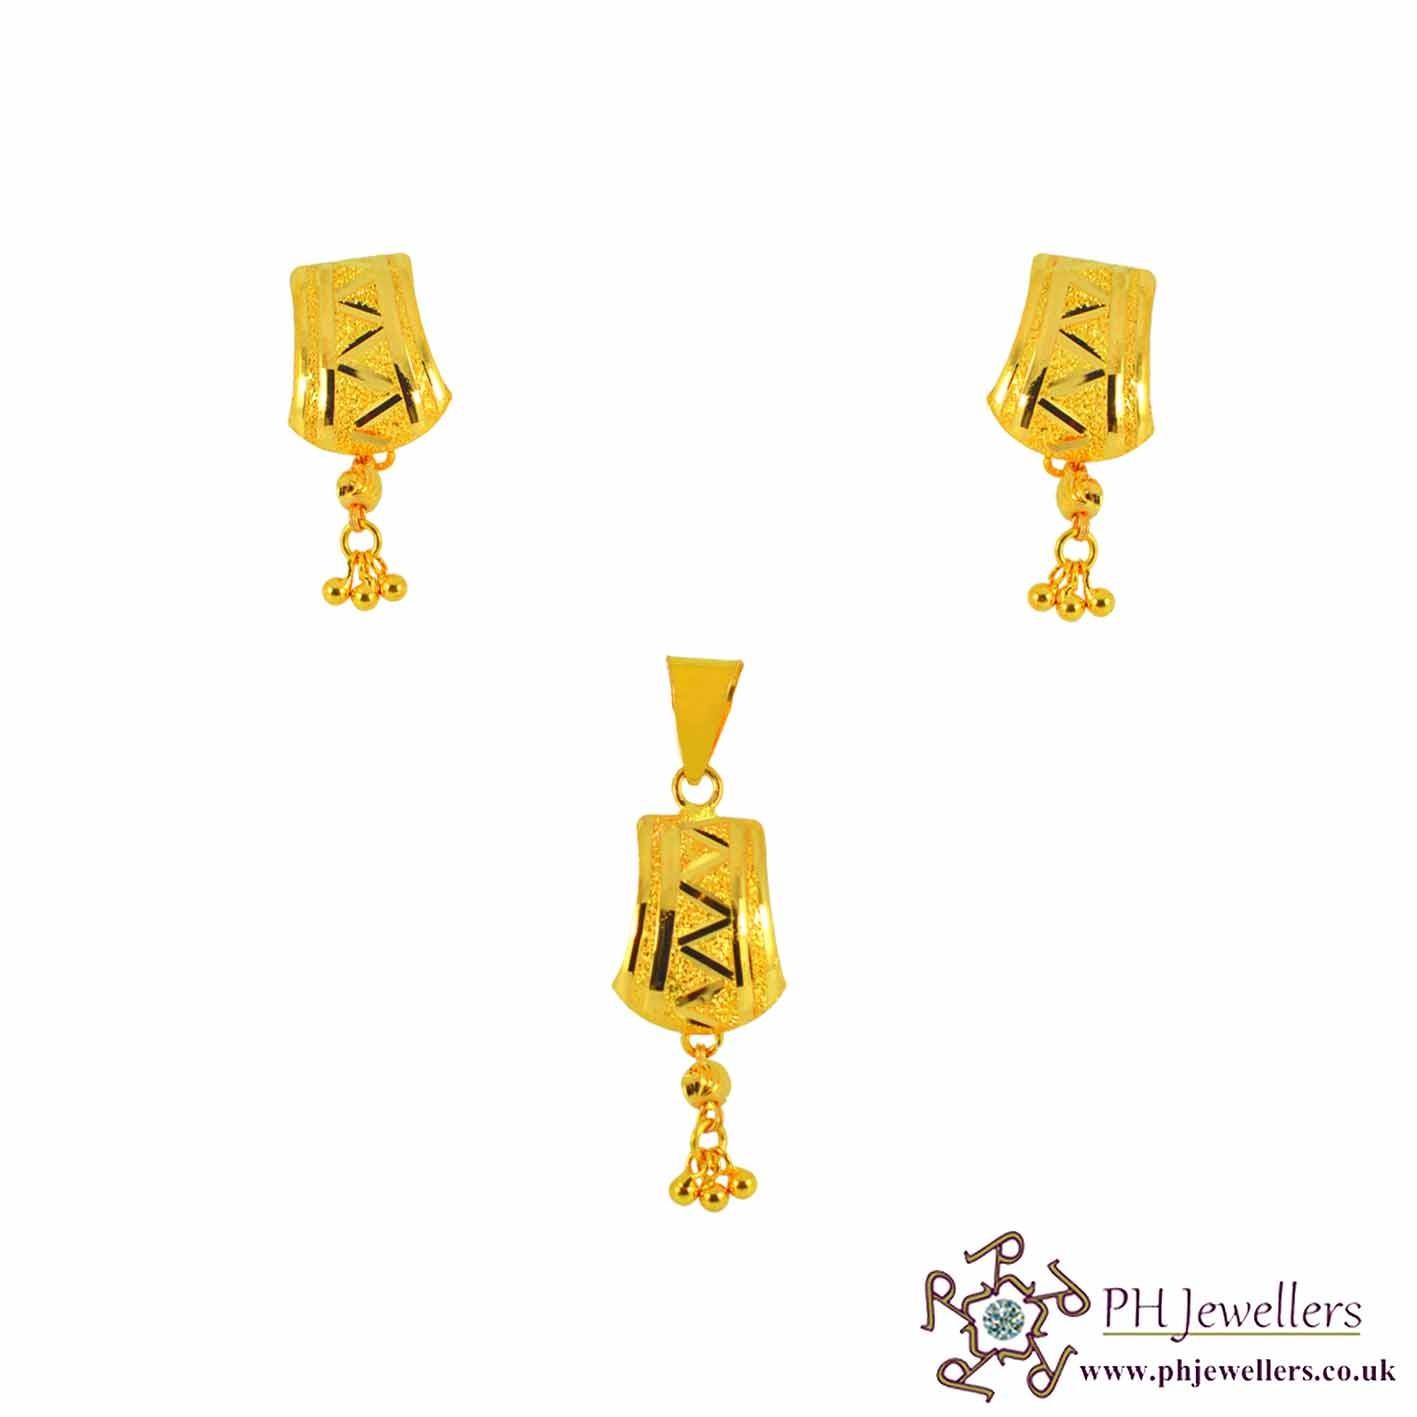 22ct 916 Yellow Gold Danglee Pendant Set PS10